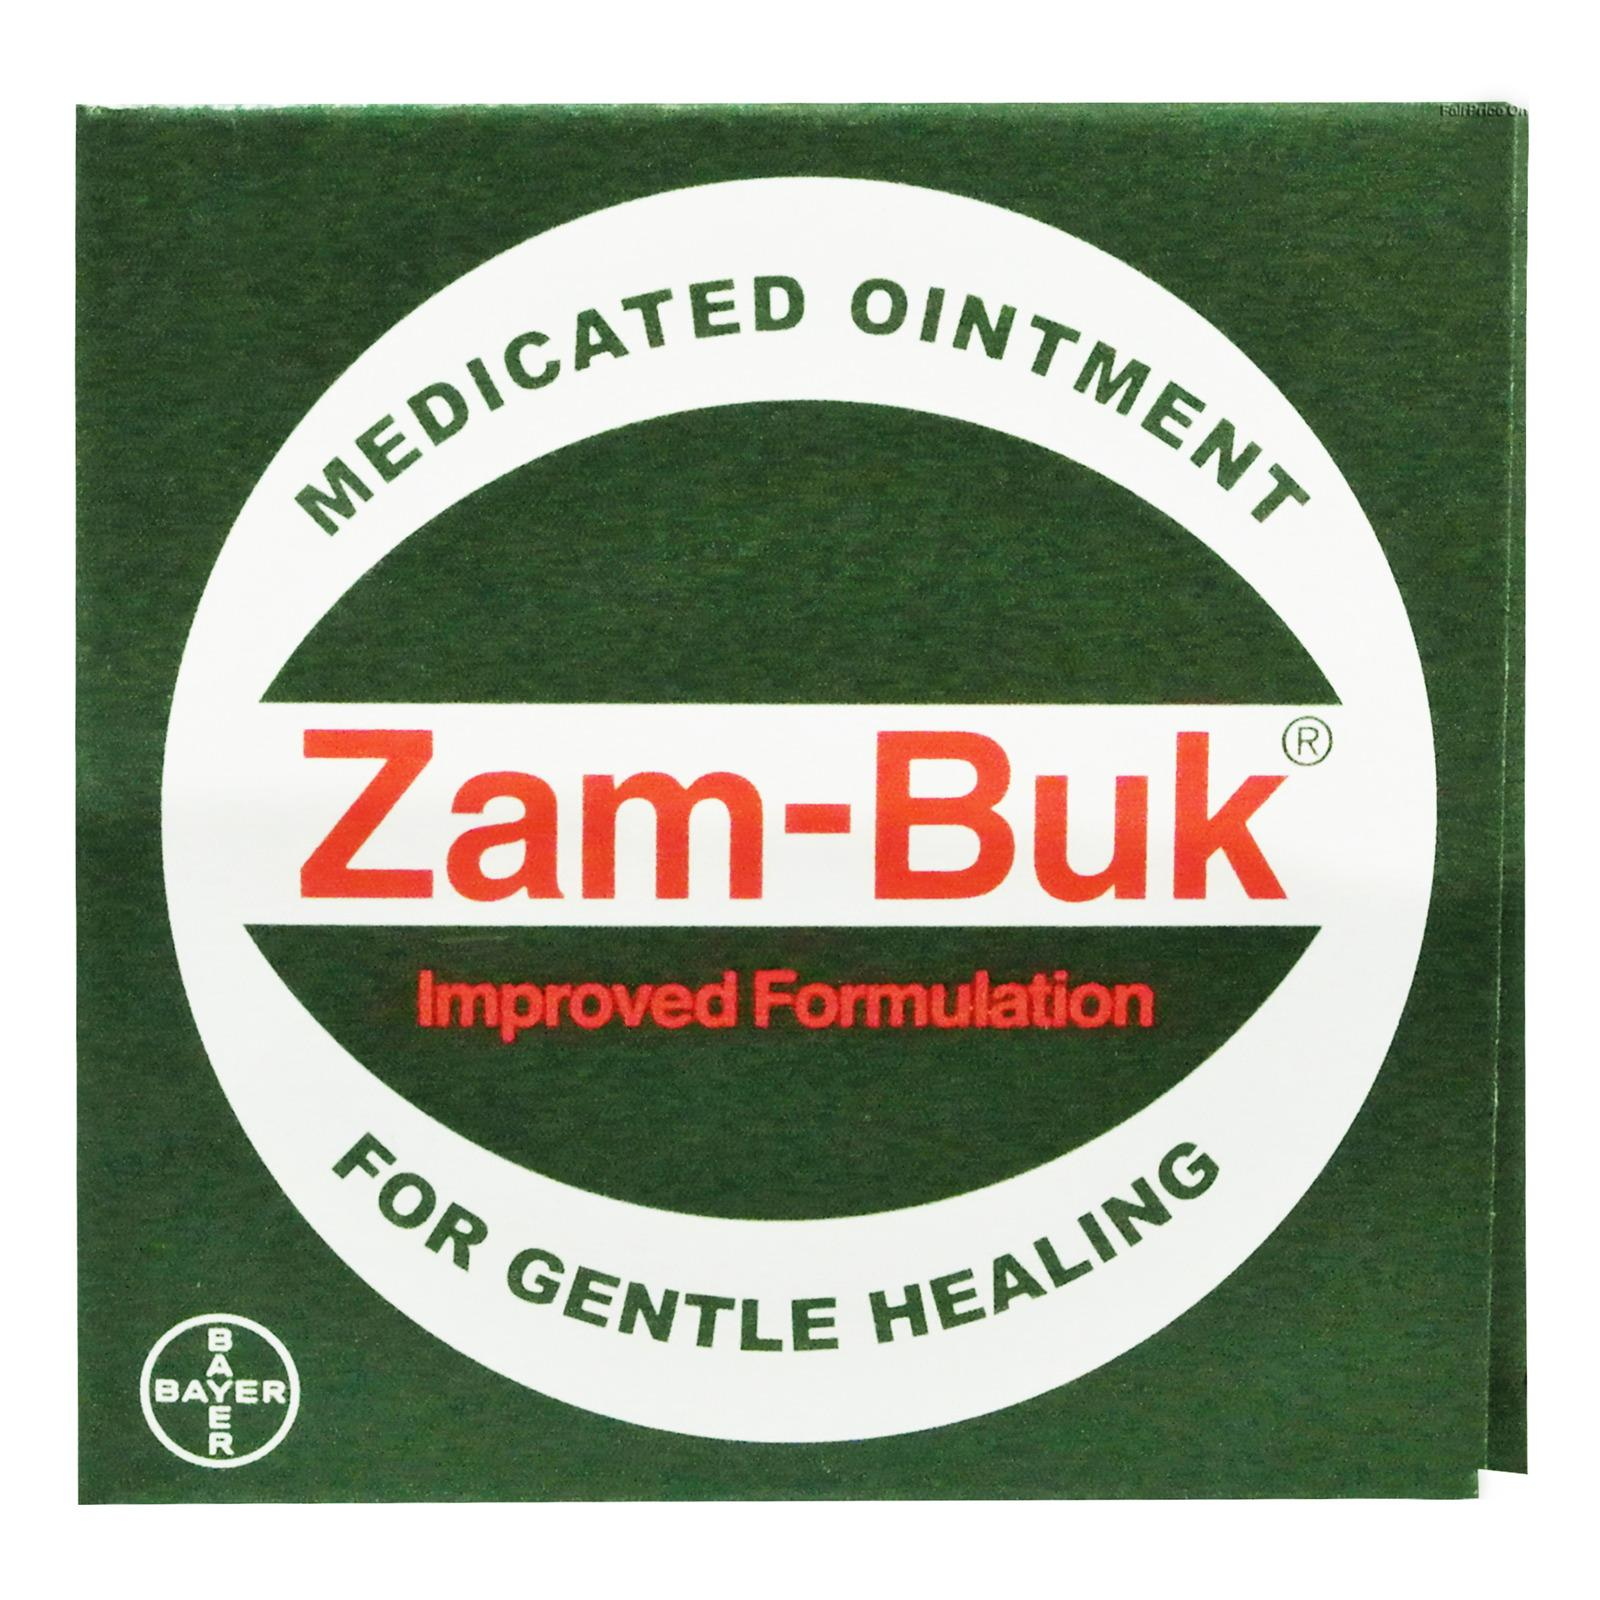 Zam-Buk Ointment 25g By The Dental Pharm.